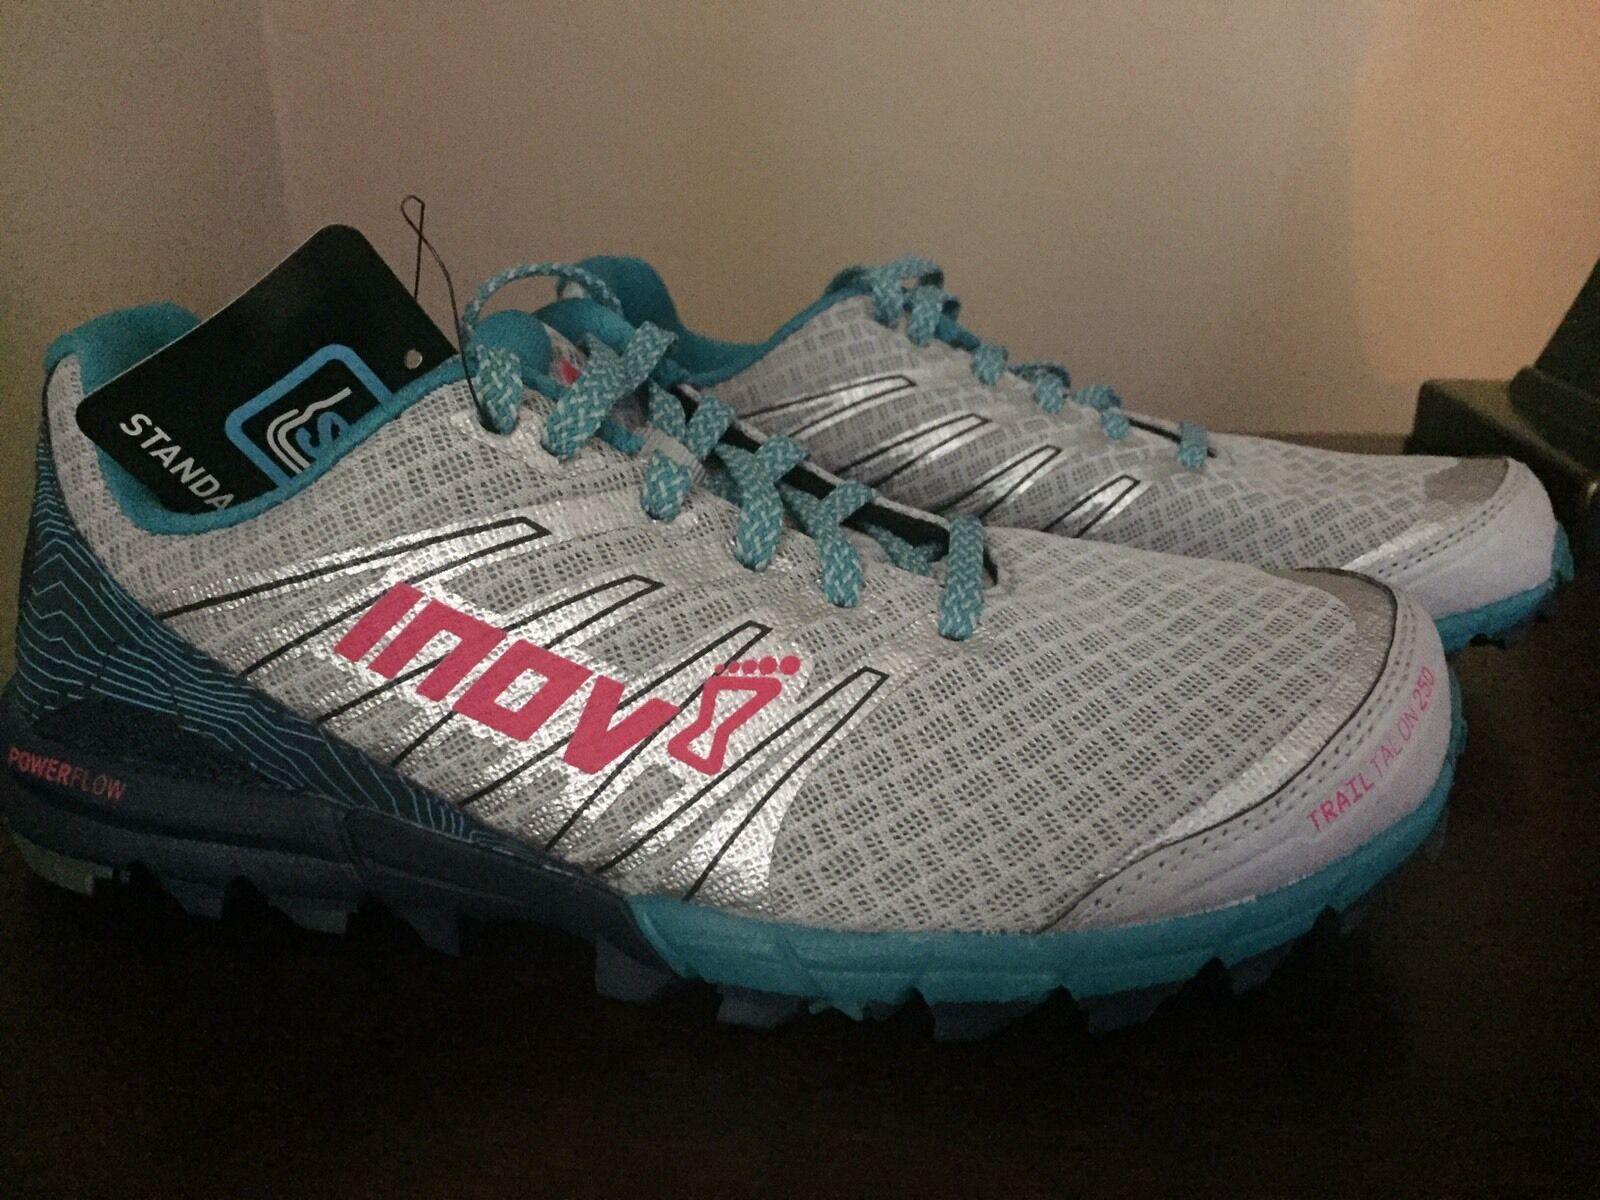 Para mujer Inov 8 trailtalon 250 trailrunning Tenis Zapatos Atléticos corrojoores 7W